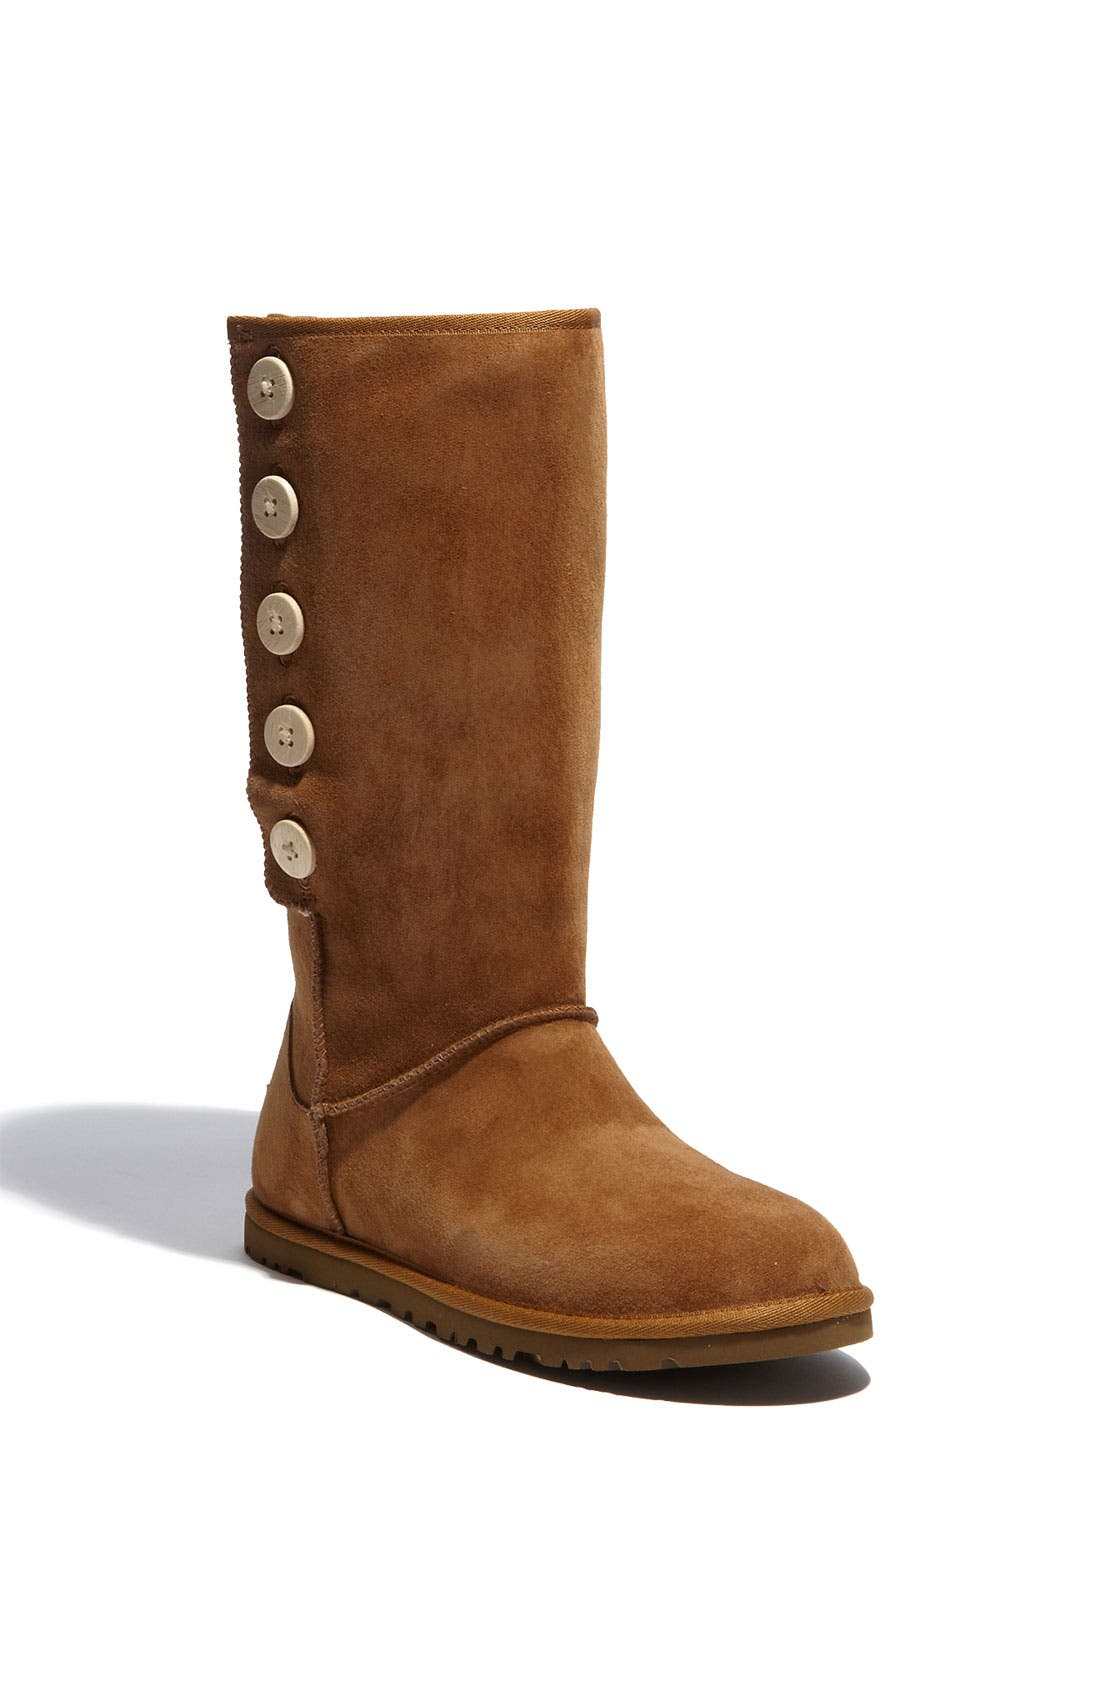 Alternate Image 1 Selected - UGG® Australia 'Lo Pro' Suede Boot (Women)